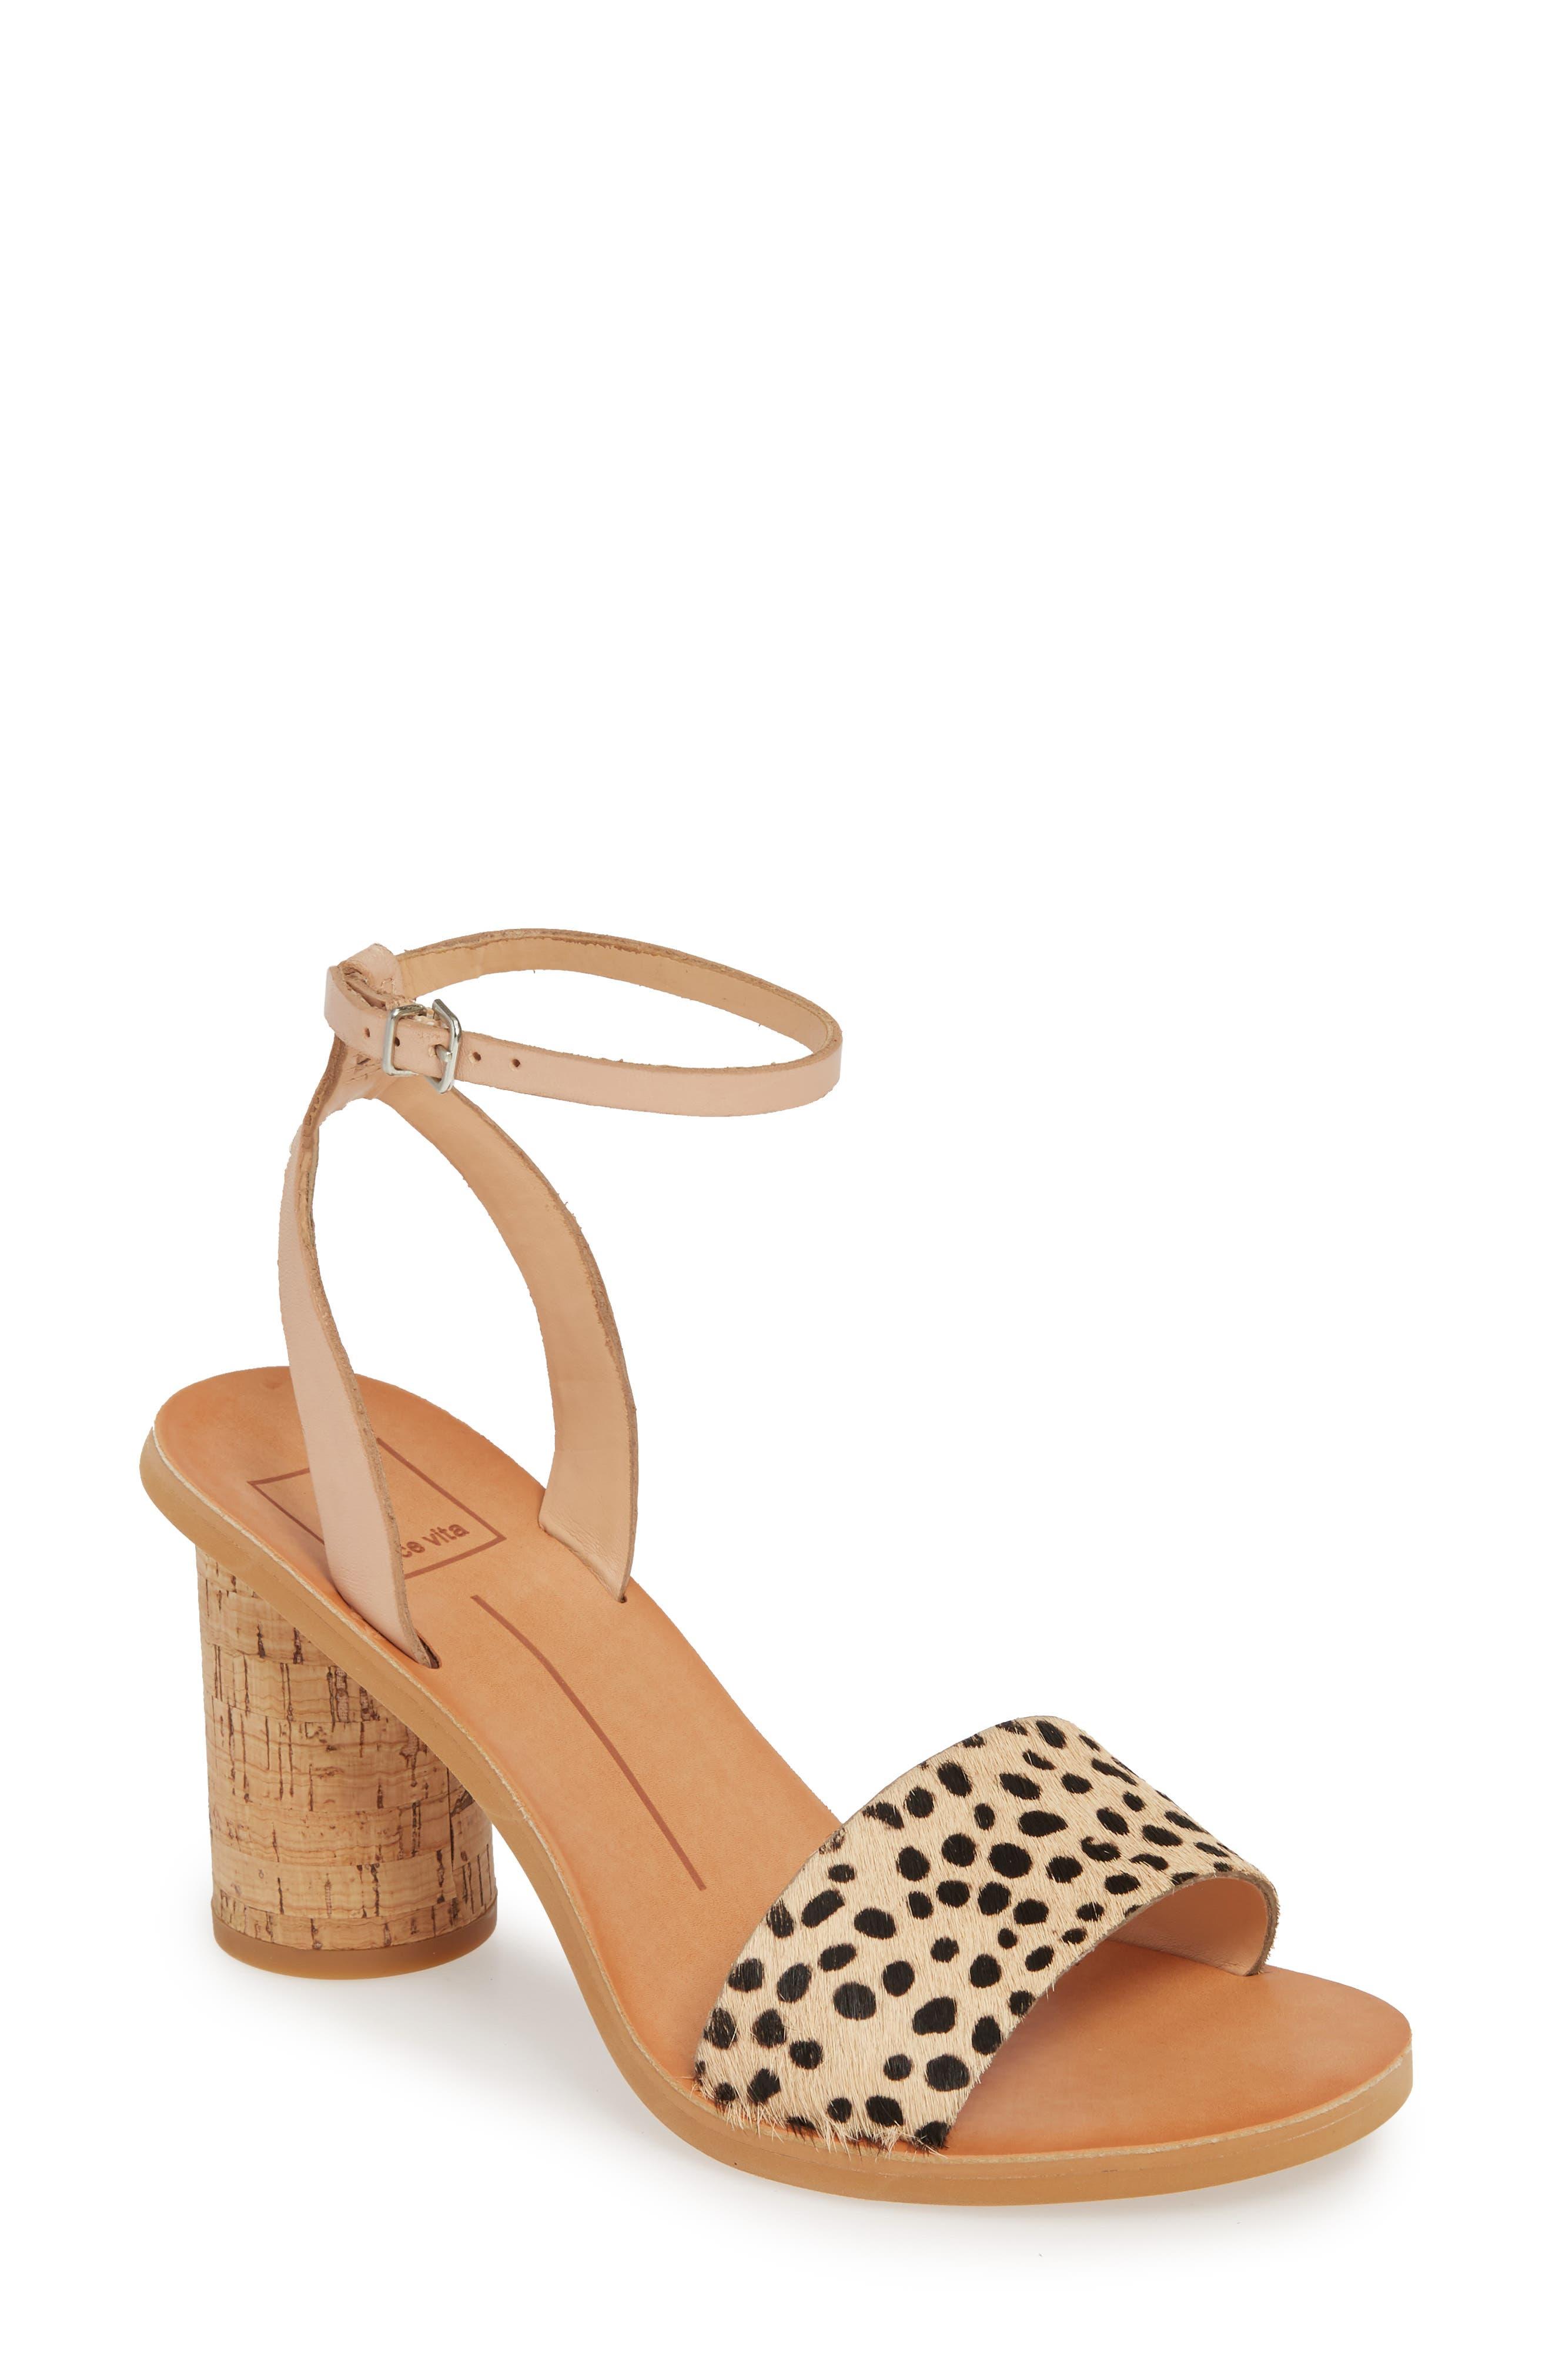 DOLCE VITA, Jali Column Heel Sandal, Main thumbnail 1, color, LEOPARD PRINT